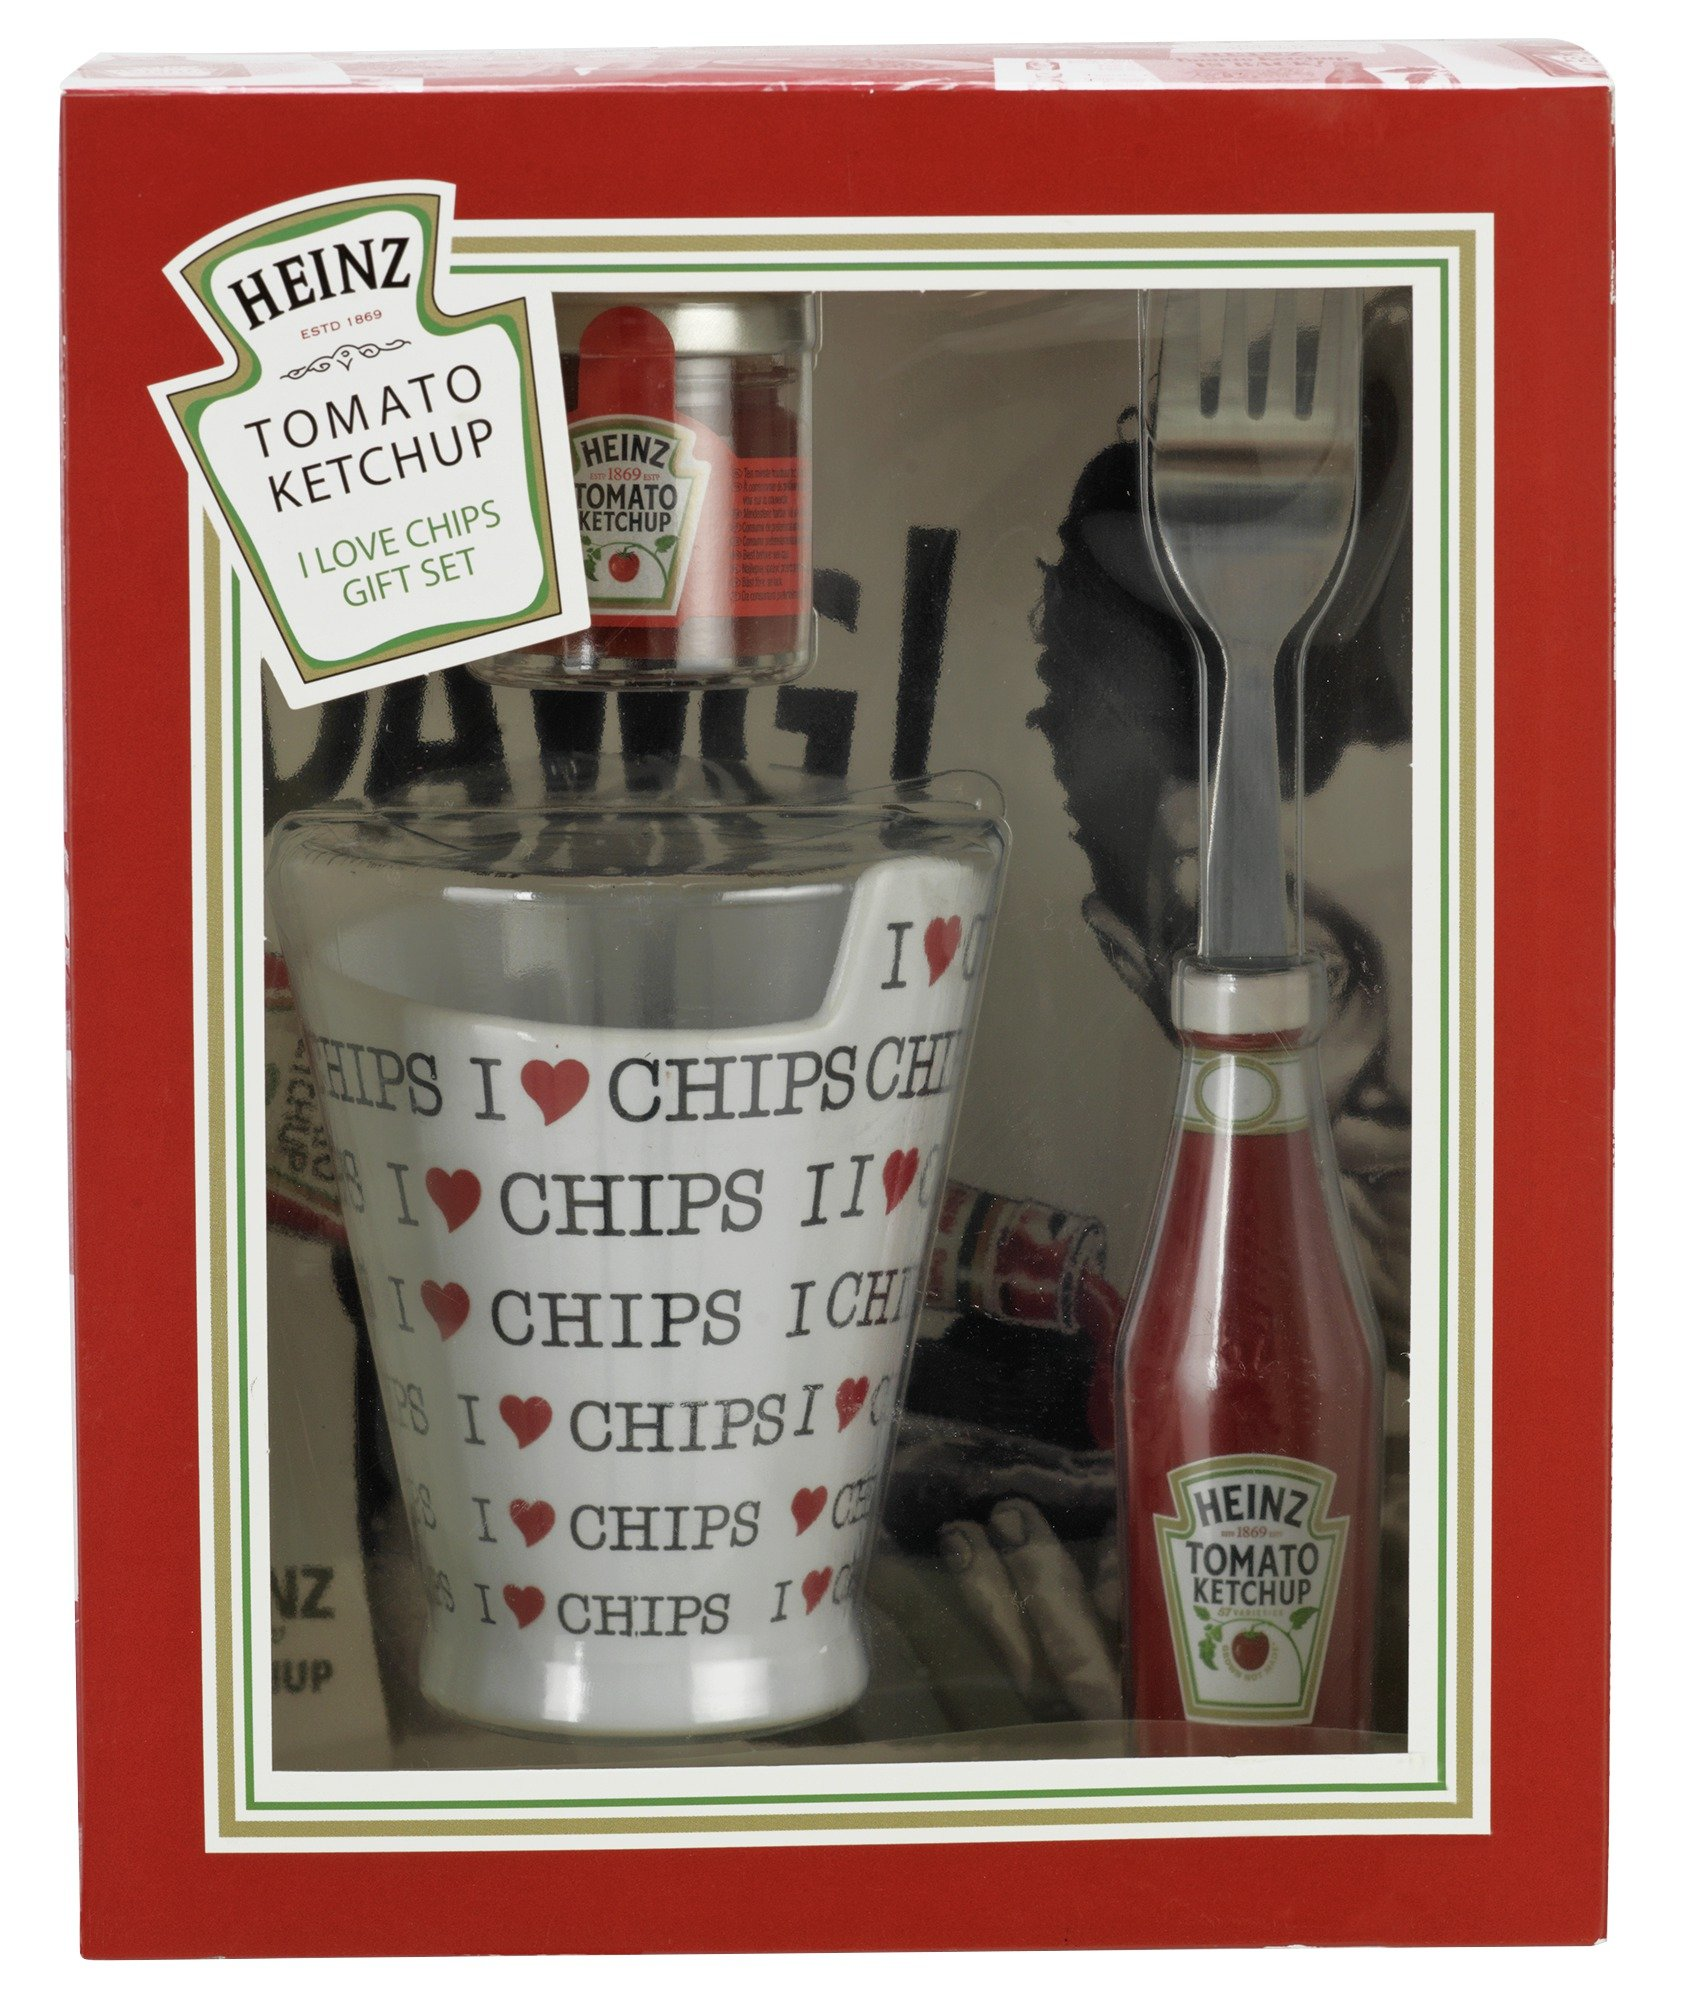 Heinz Ketchup I Love Chips Gift Set.